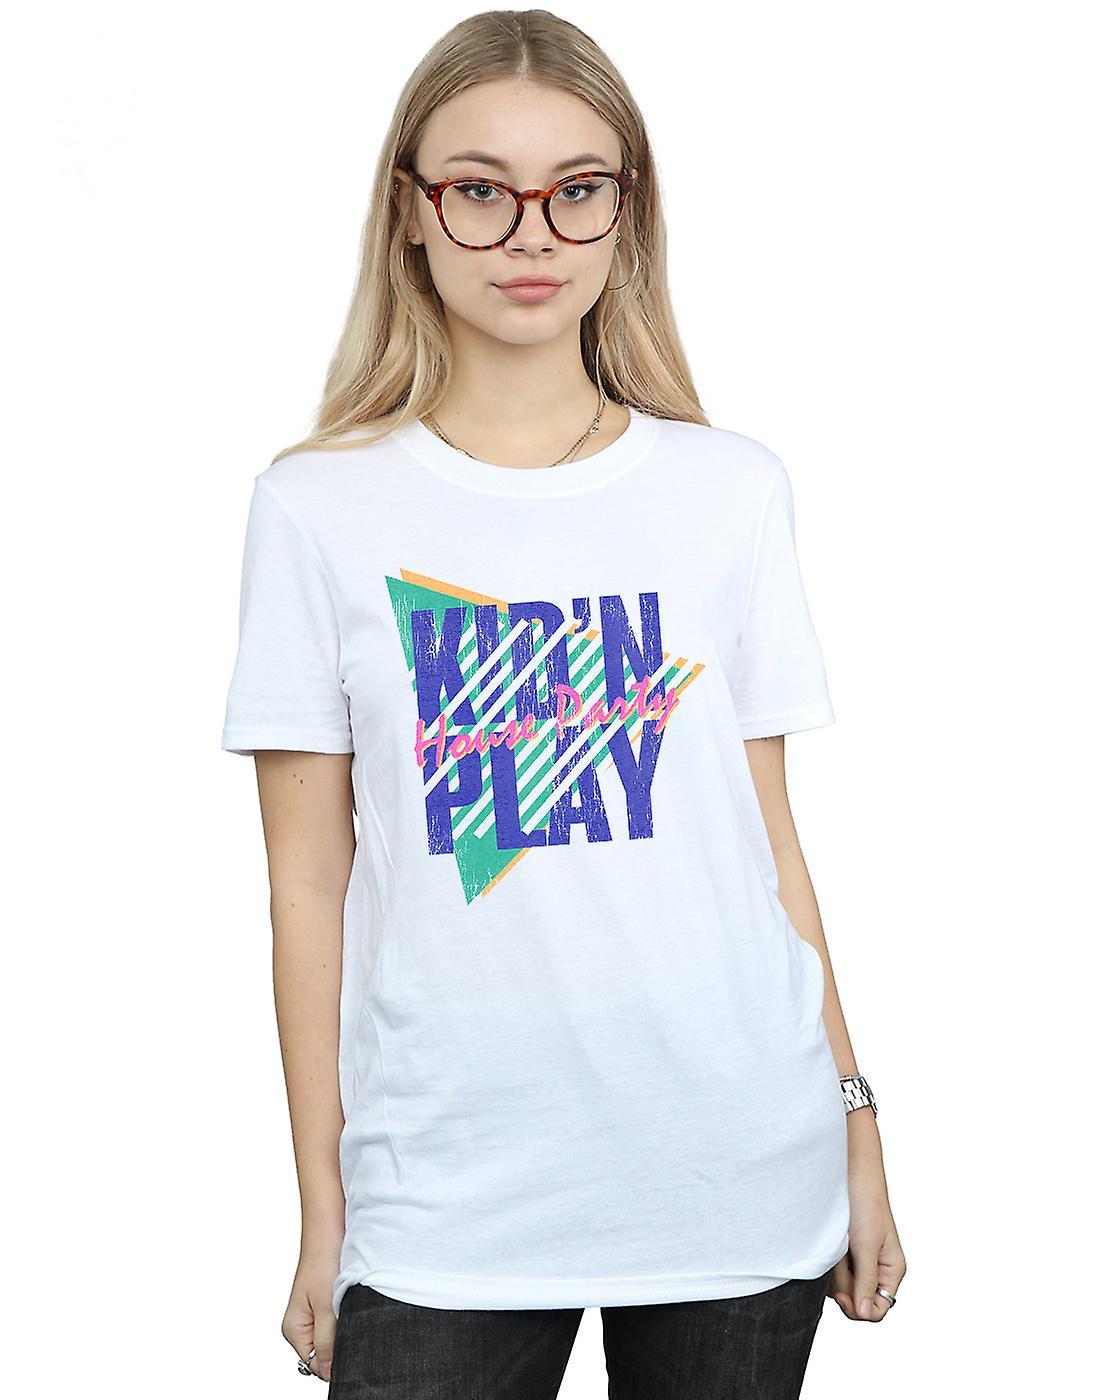 Kid N Play Women's House Party Stripes Boyfriend Fit T-Shirt